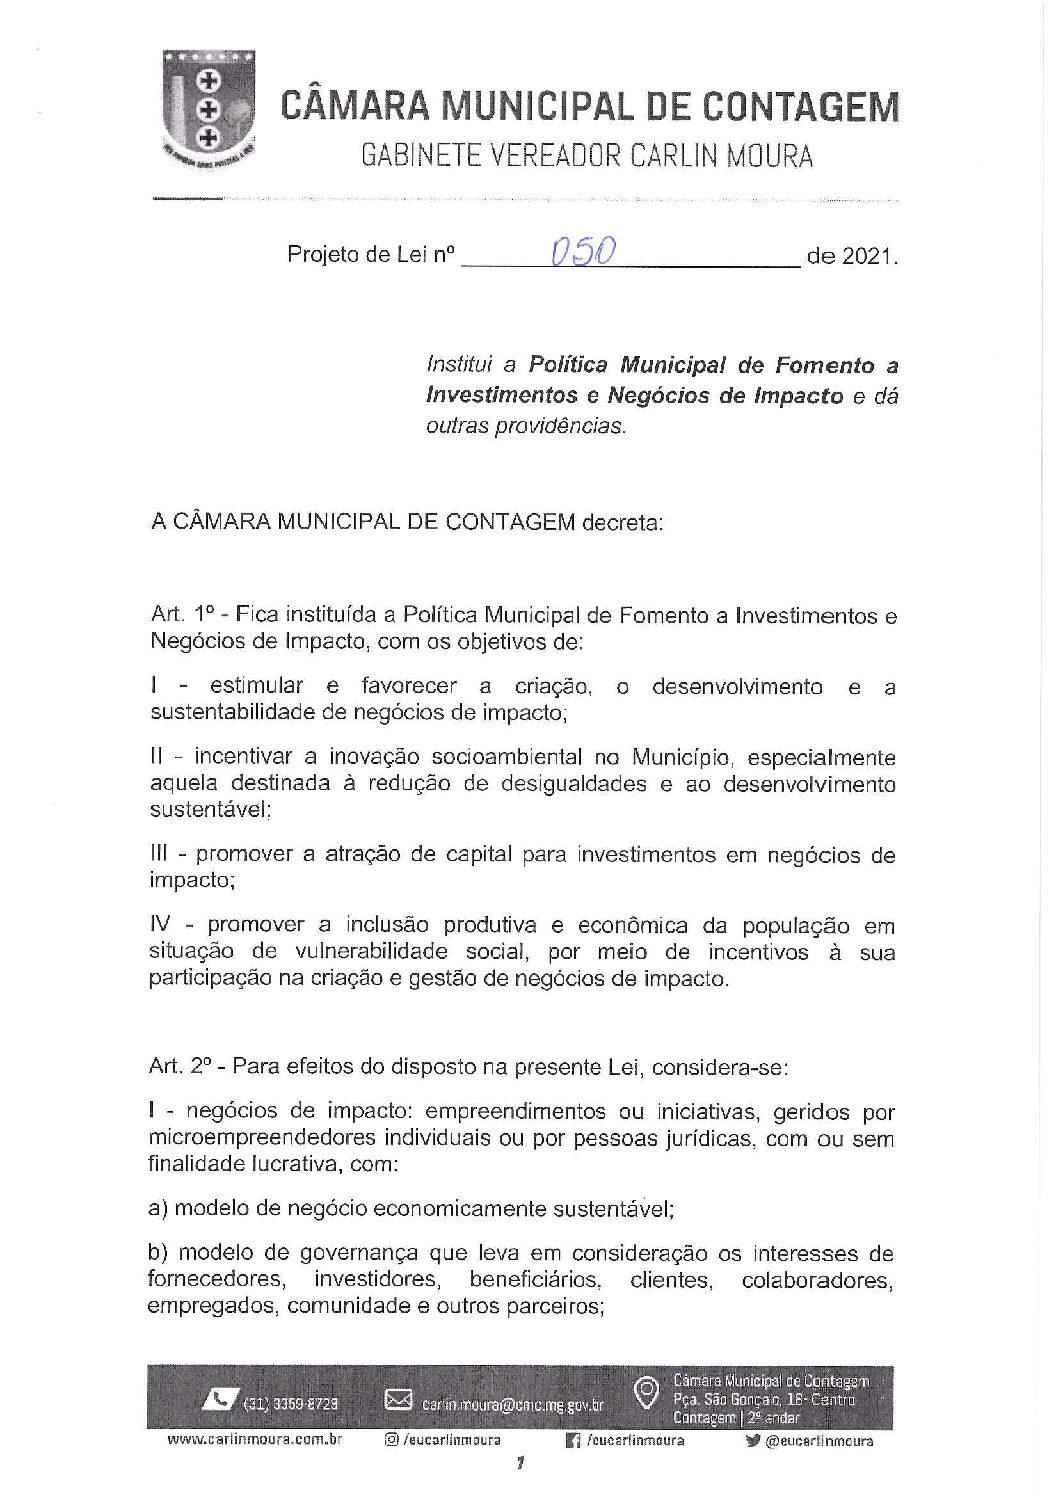 Projeto de lei 0050/2021